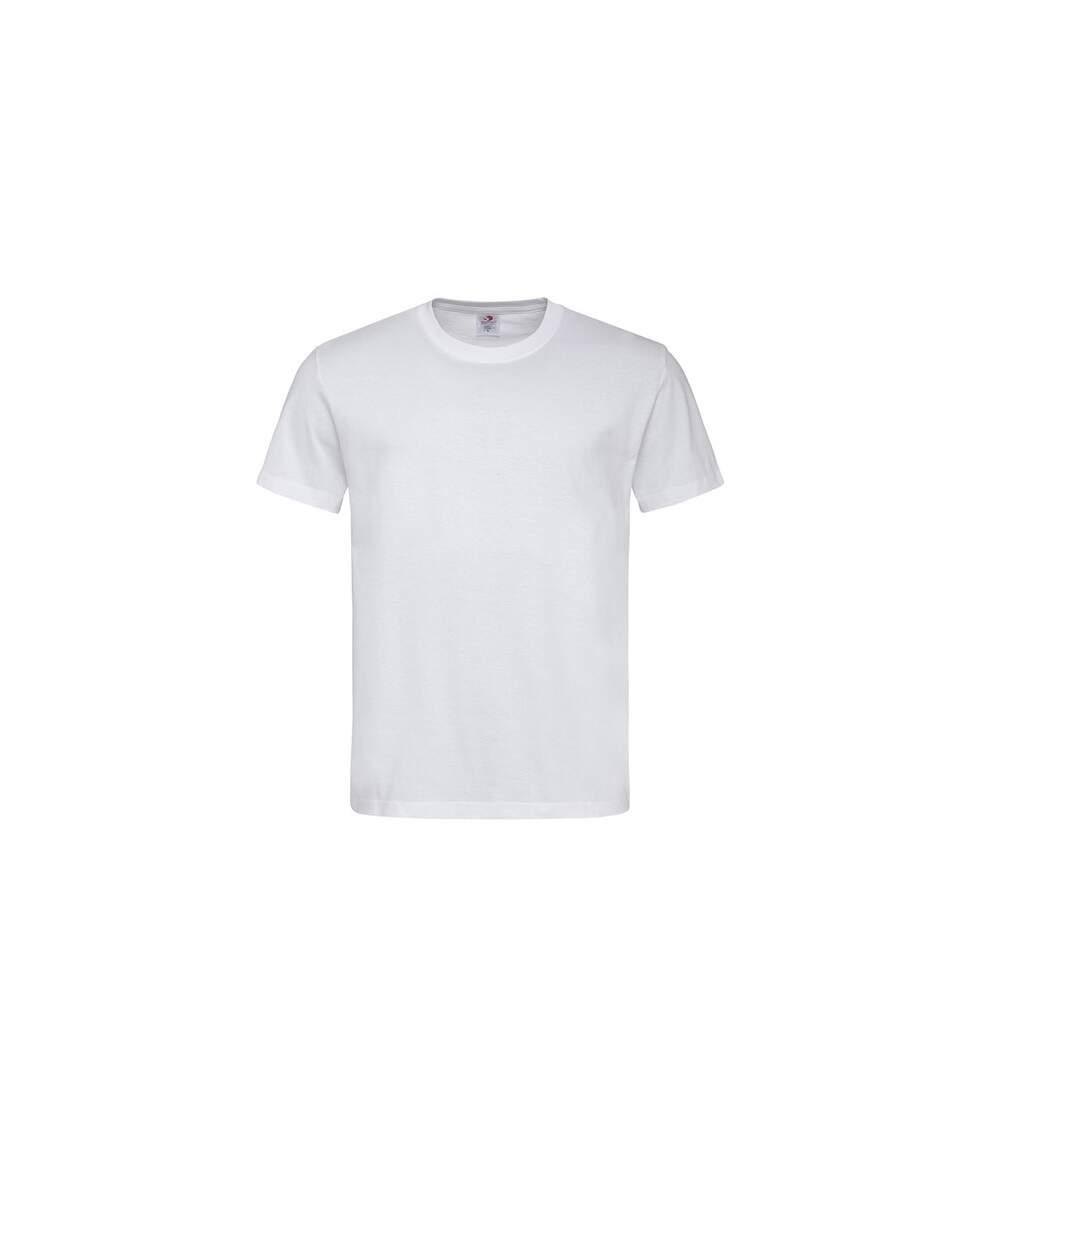 Stedman Mens Classic Tee (White) - UTAB269